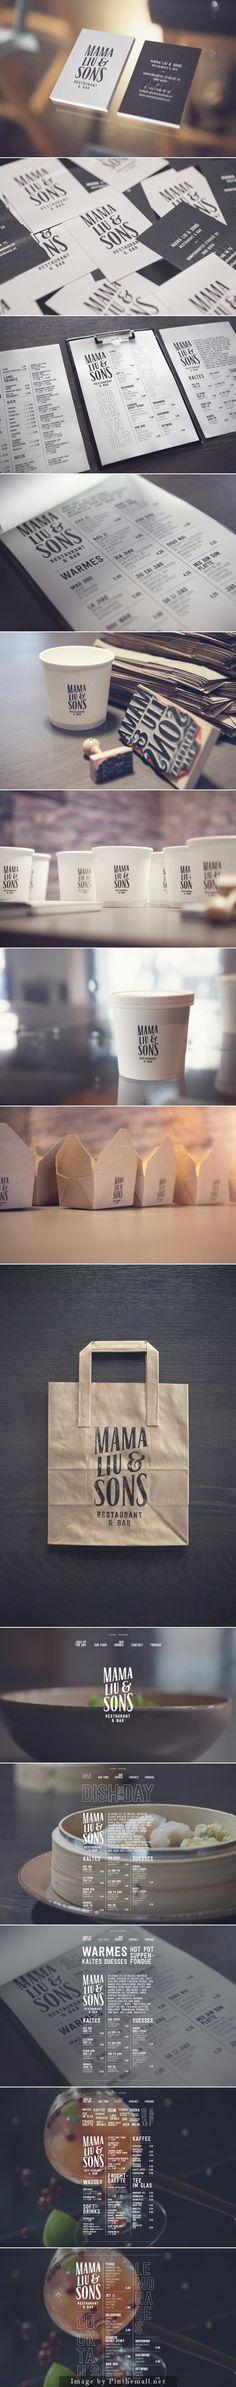 Mama Liu & Sons branding corporate identity stationary packaging cup bag box…